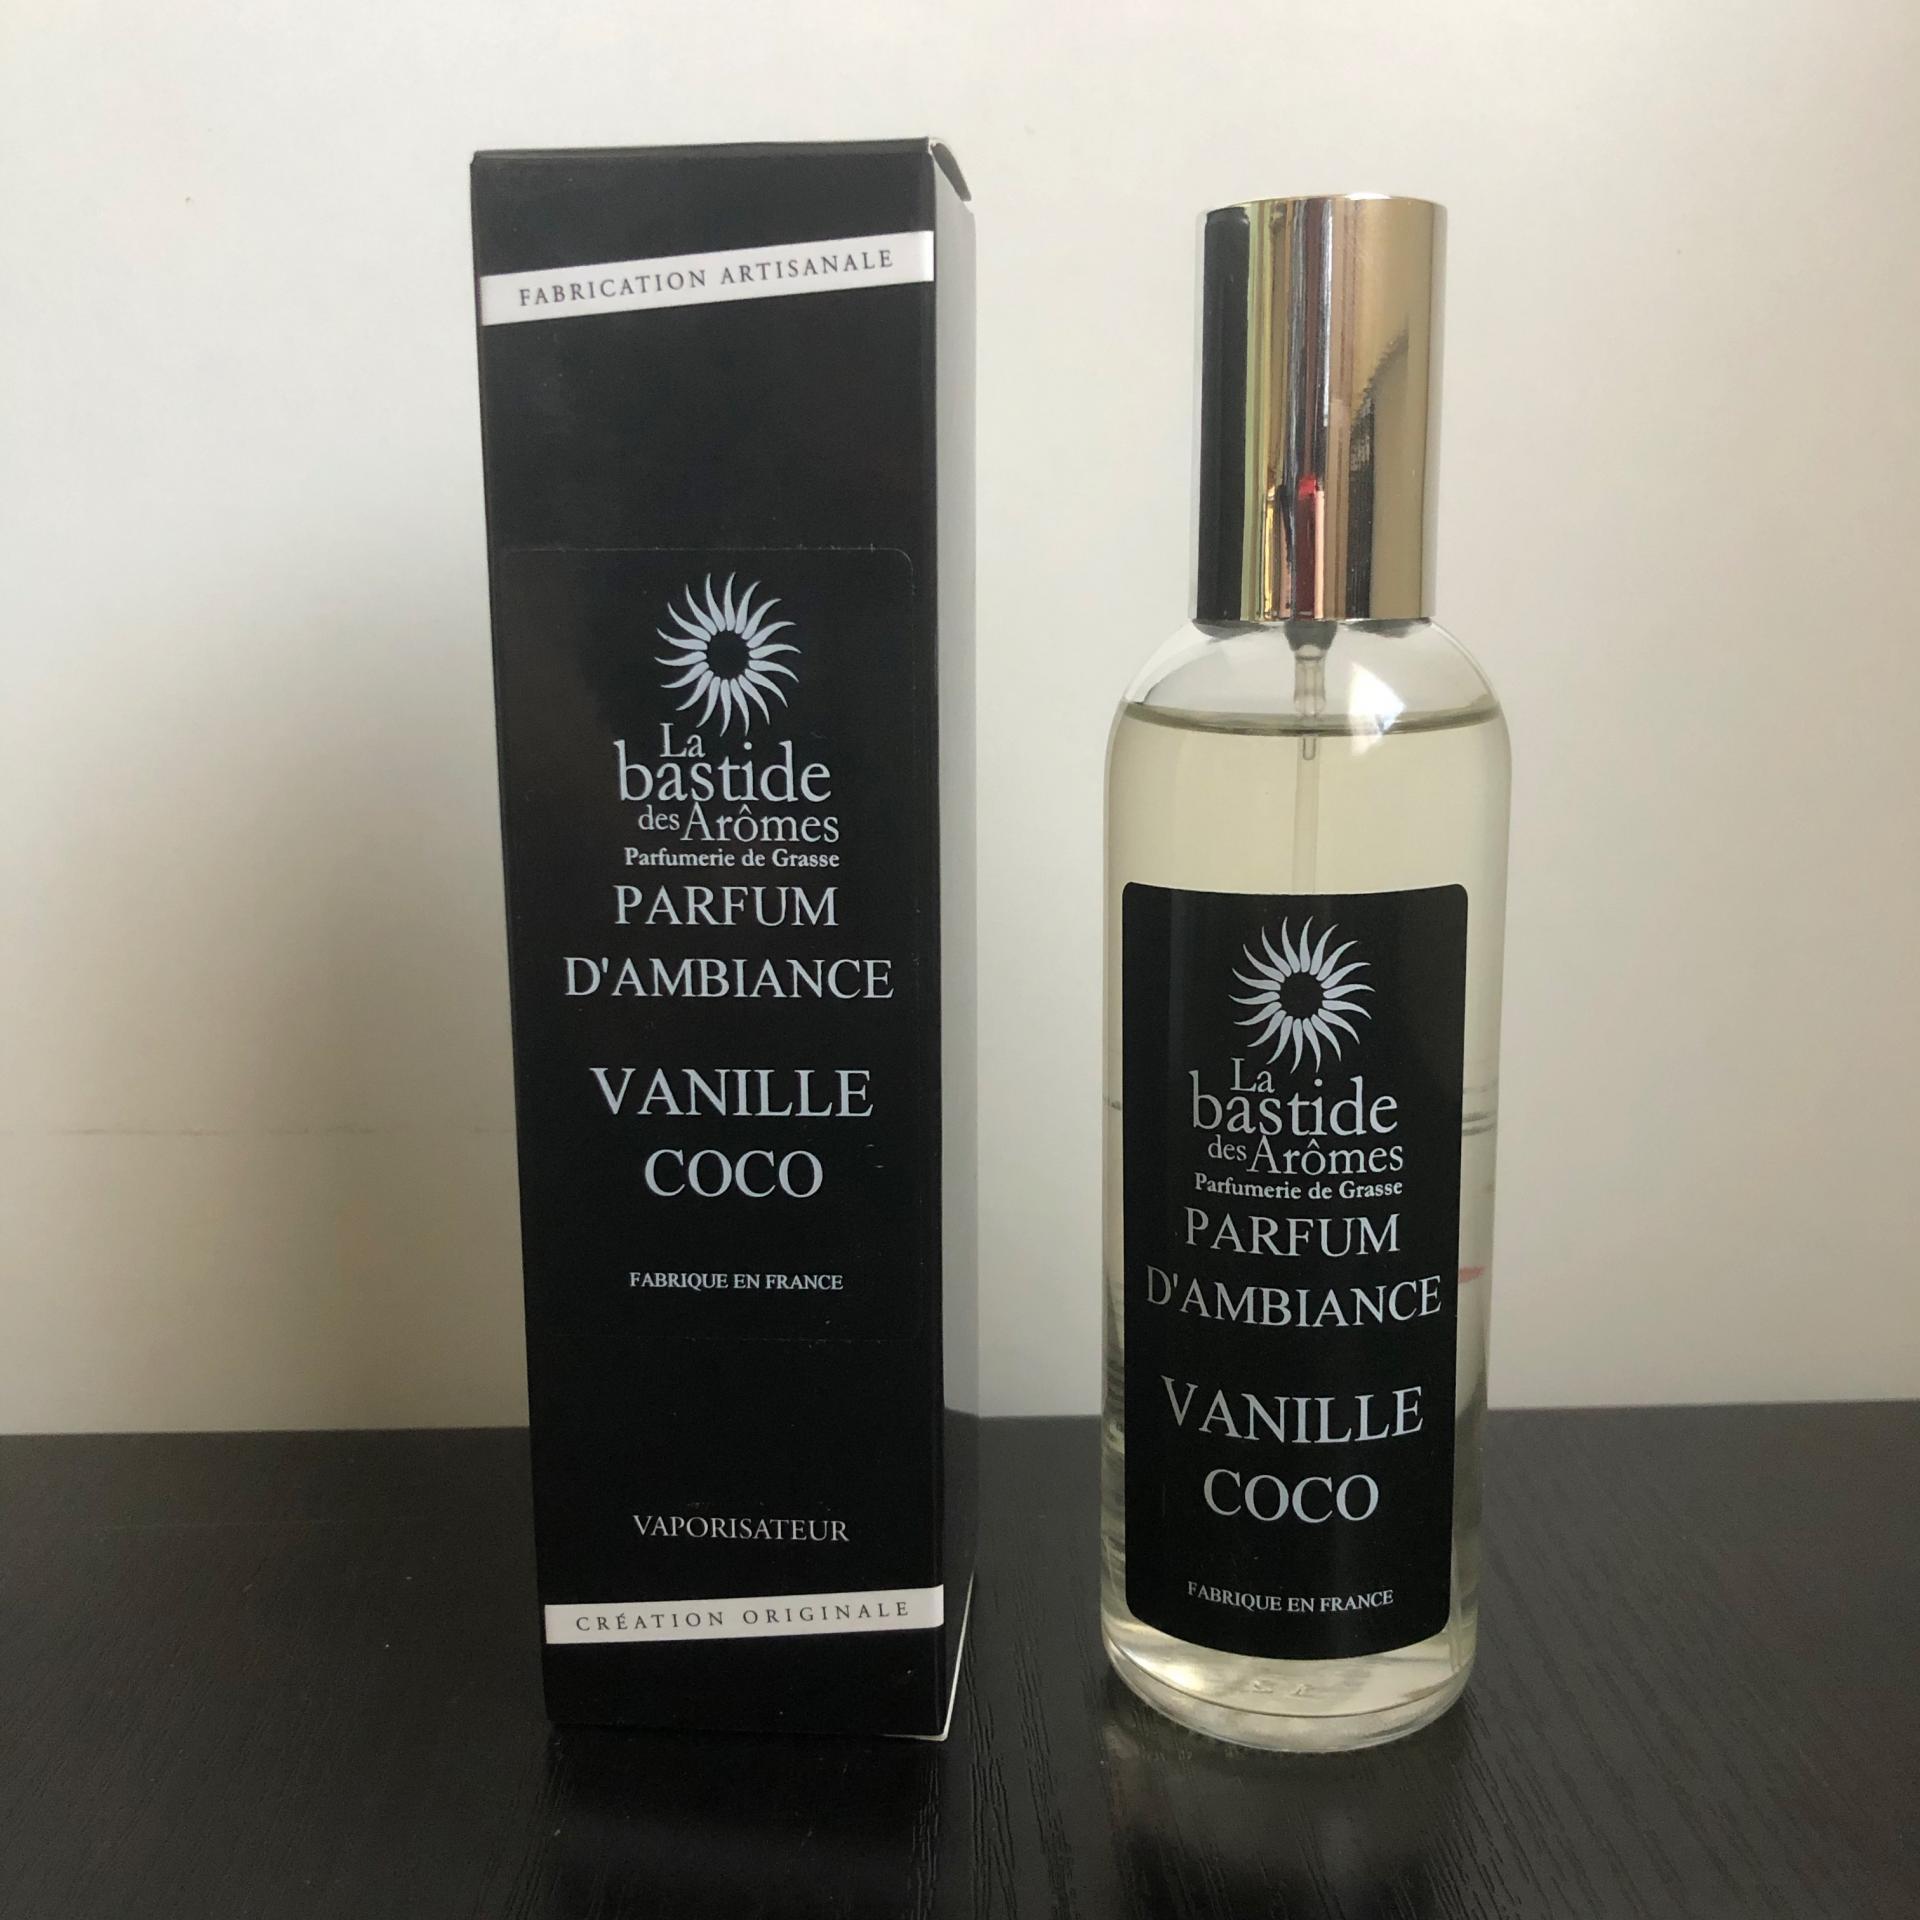 Parfum d ambiance vanille coco